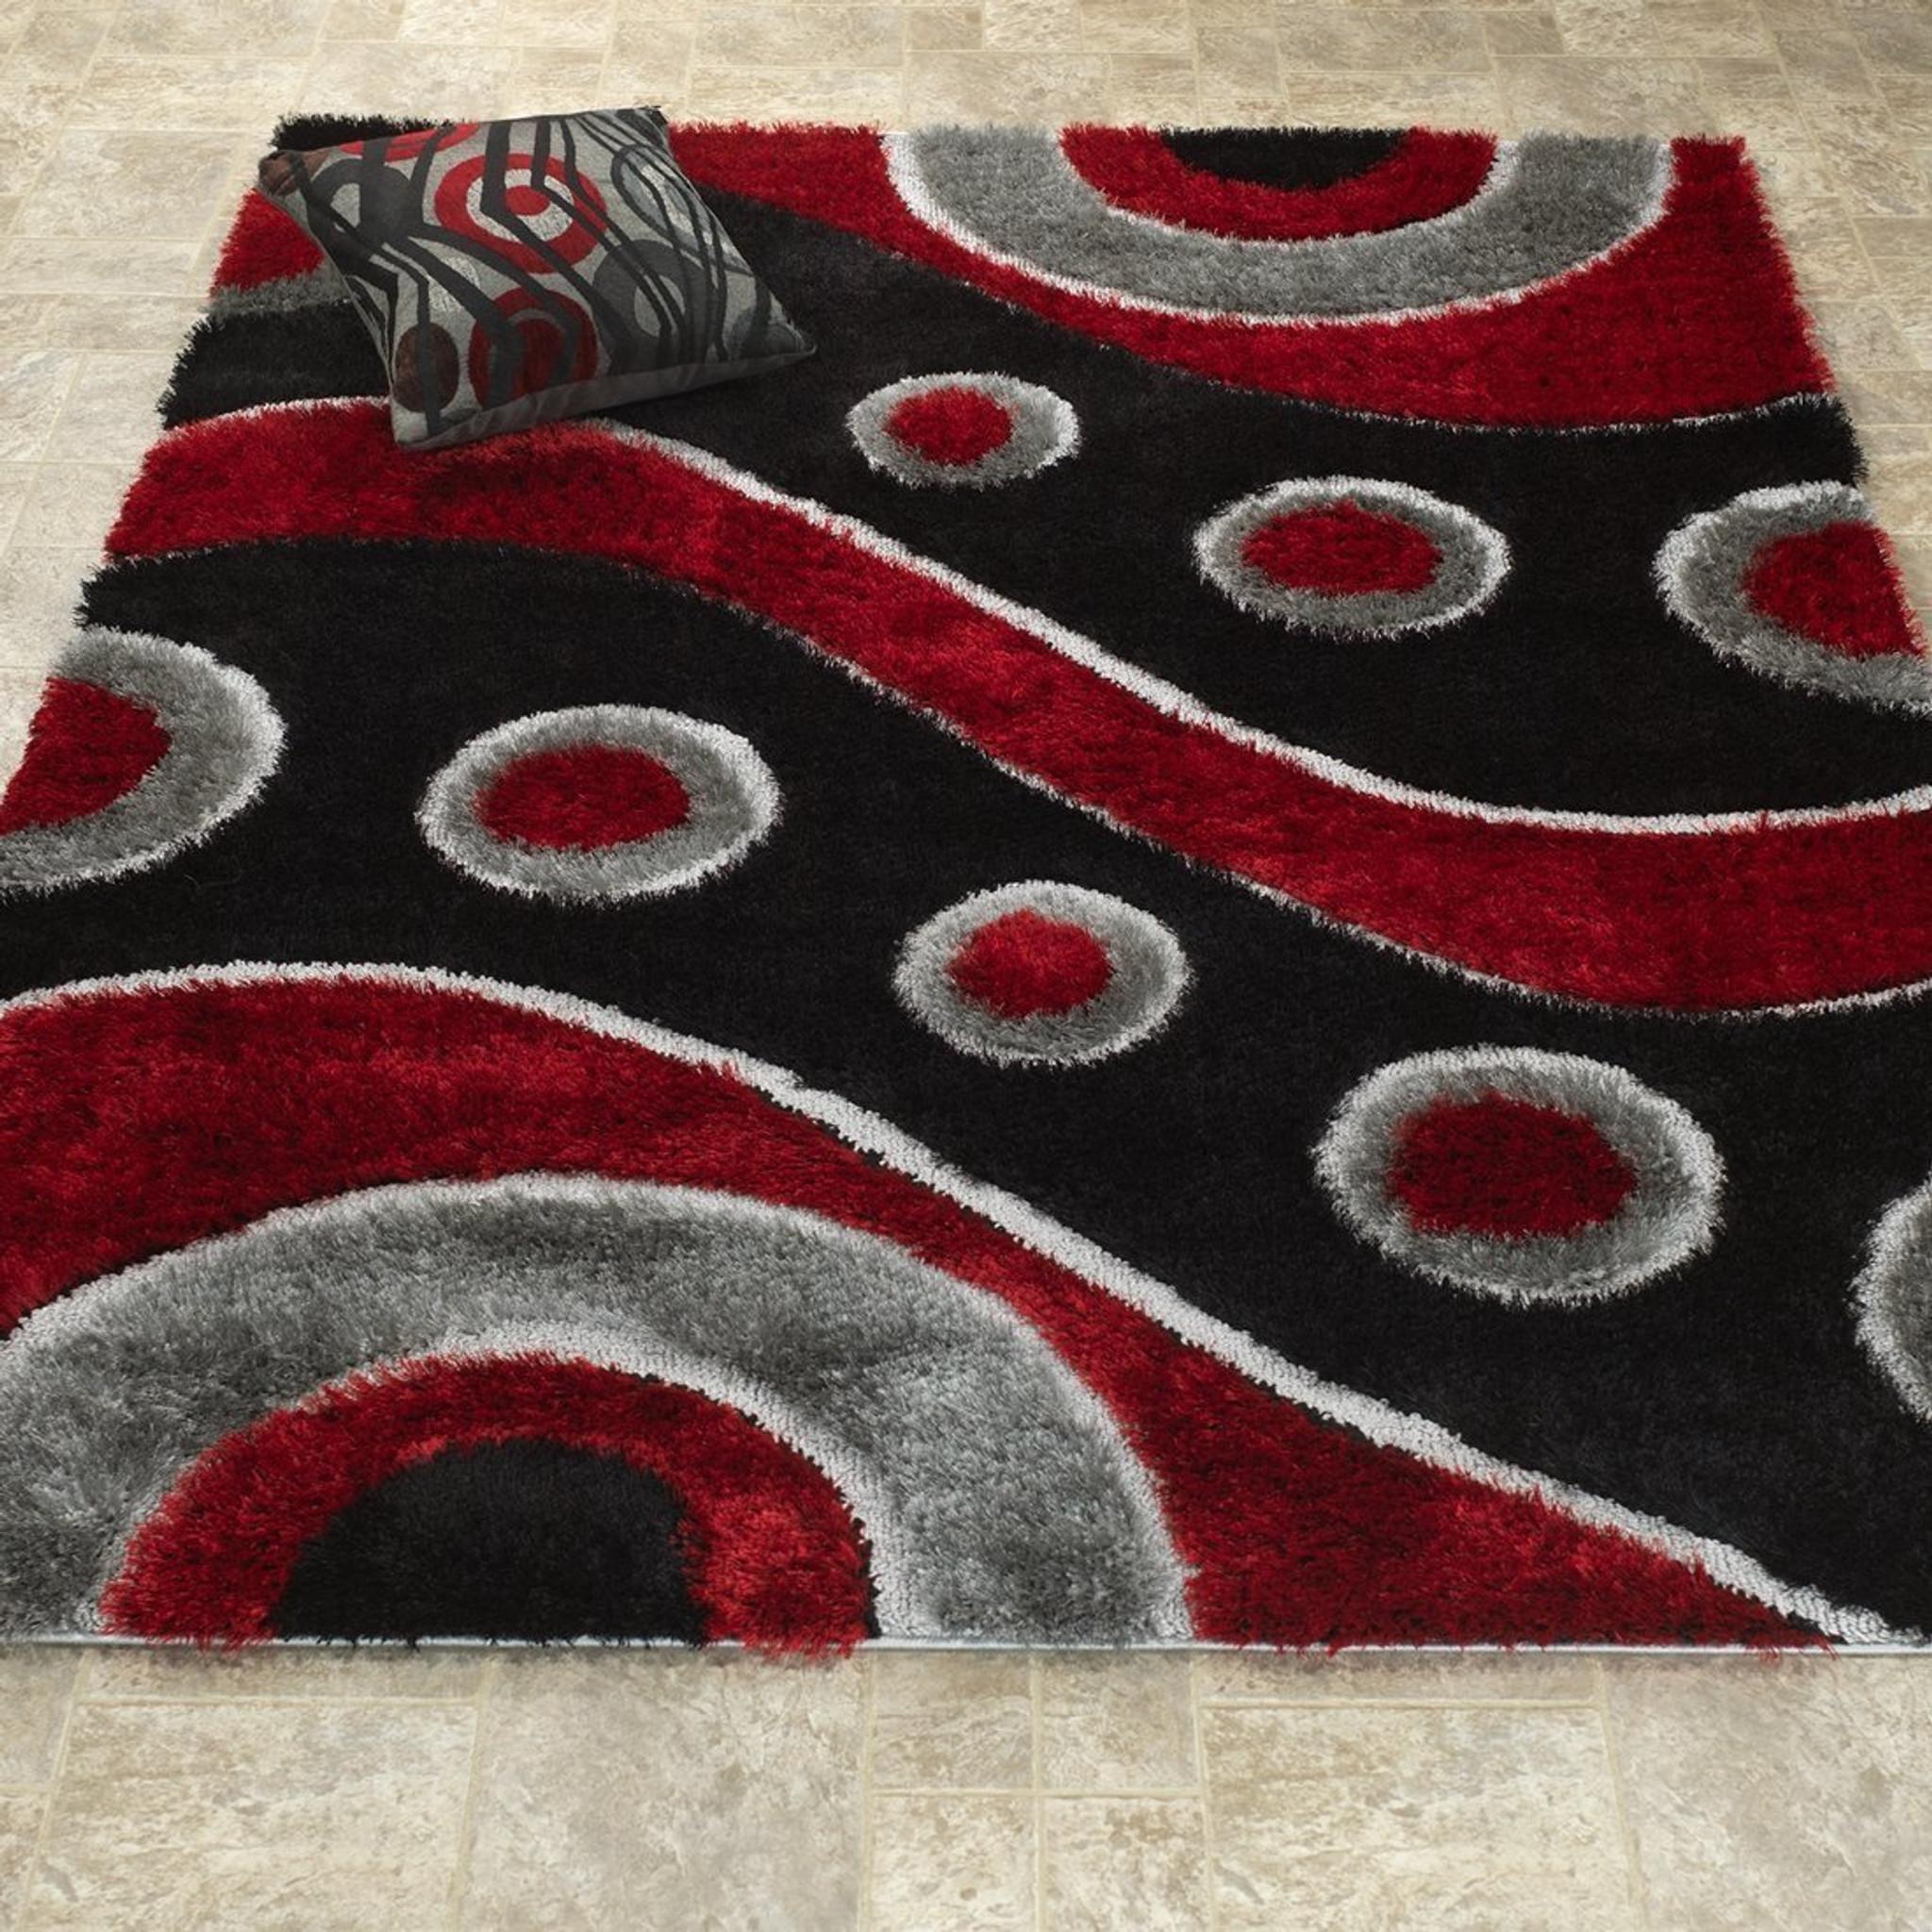 Csr3950 5x7 Casa Shag 3d Red Black Area Rug By Km Rugs